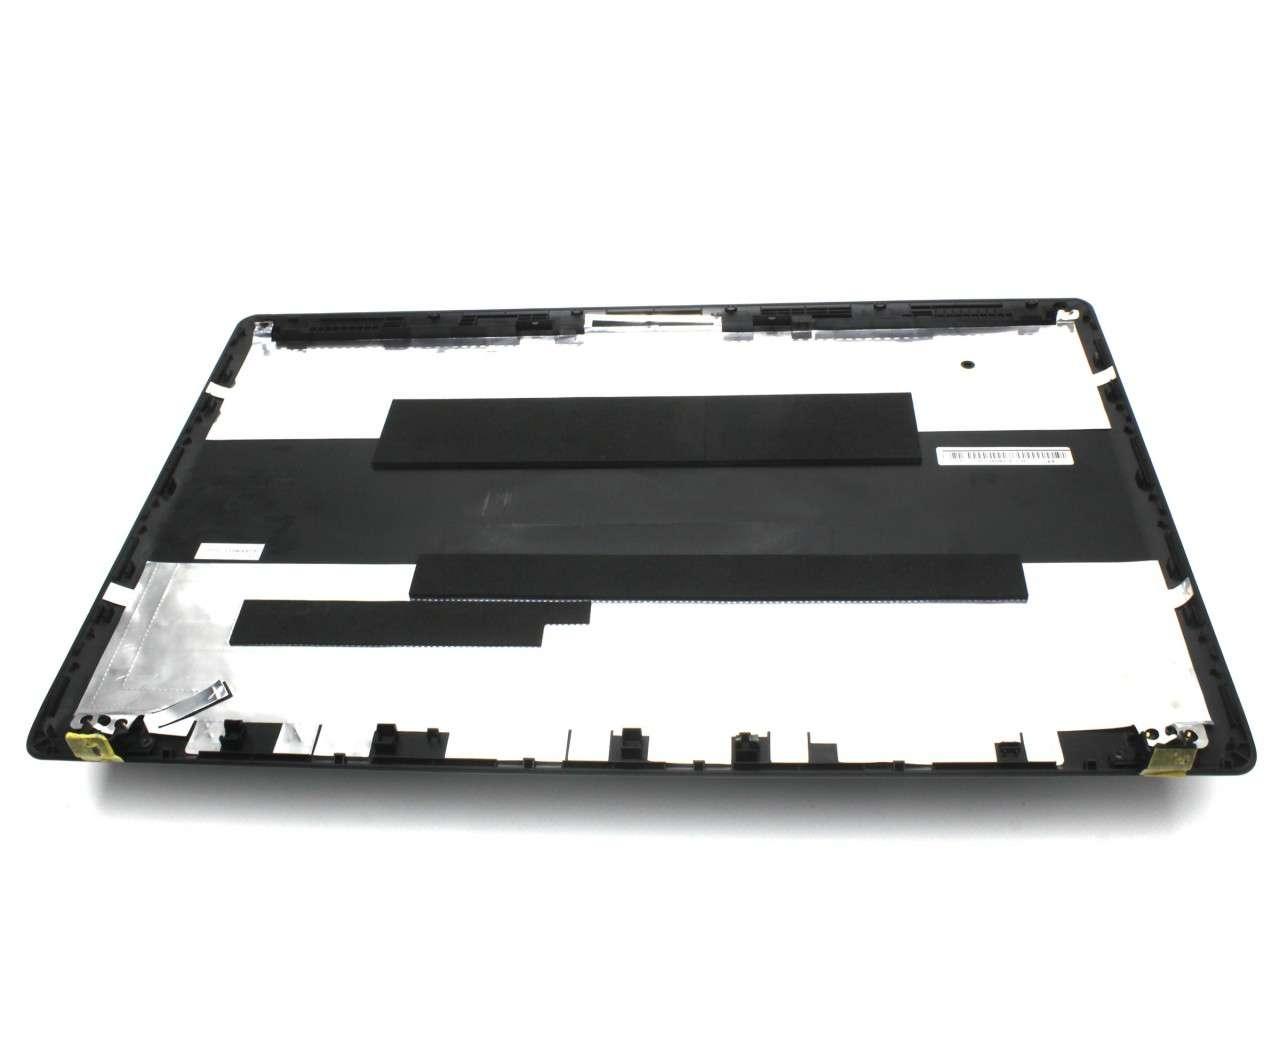 Capac Display BackCover IBM Lenovo G575GC Carcasa Display Neagra imagine powerlaptop.ro 2021